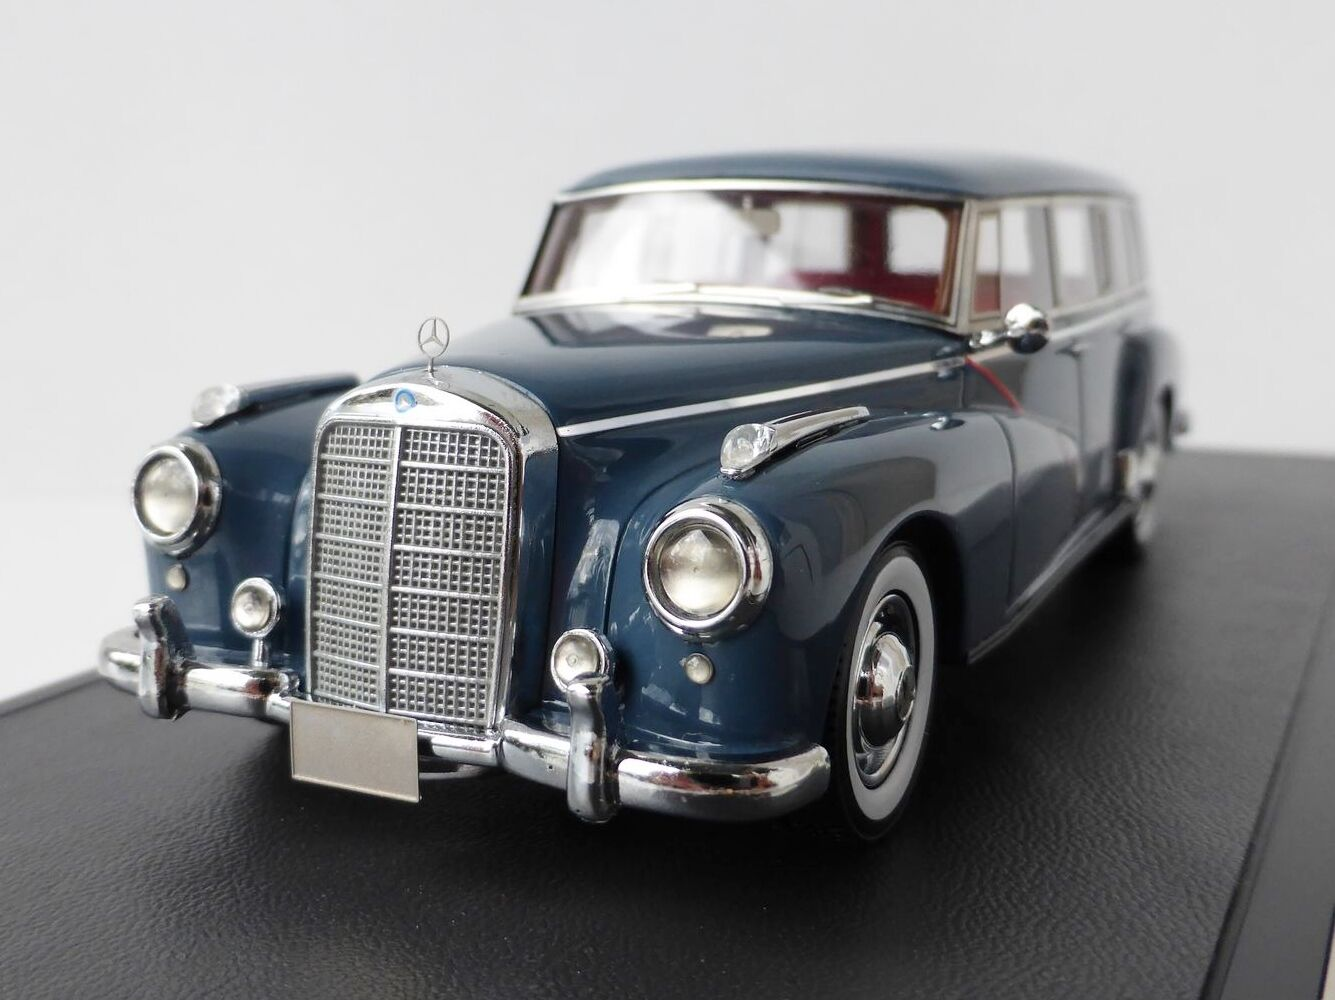 Binz Mercedes-Benz 300 C WAGON 1956 1 43 Matrix mx51302-022 mx51302 Break Kombi